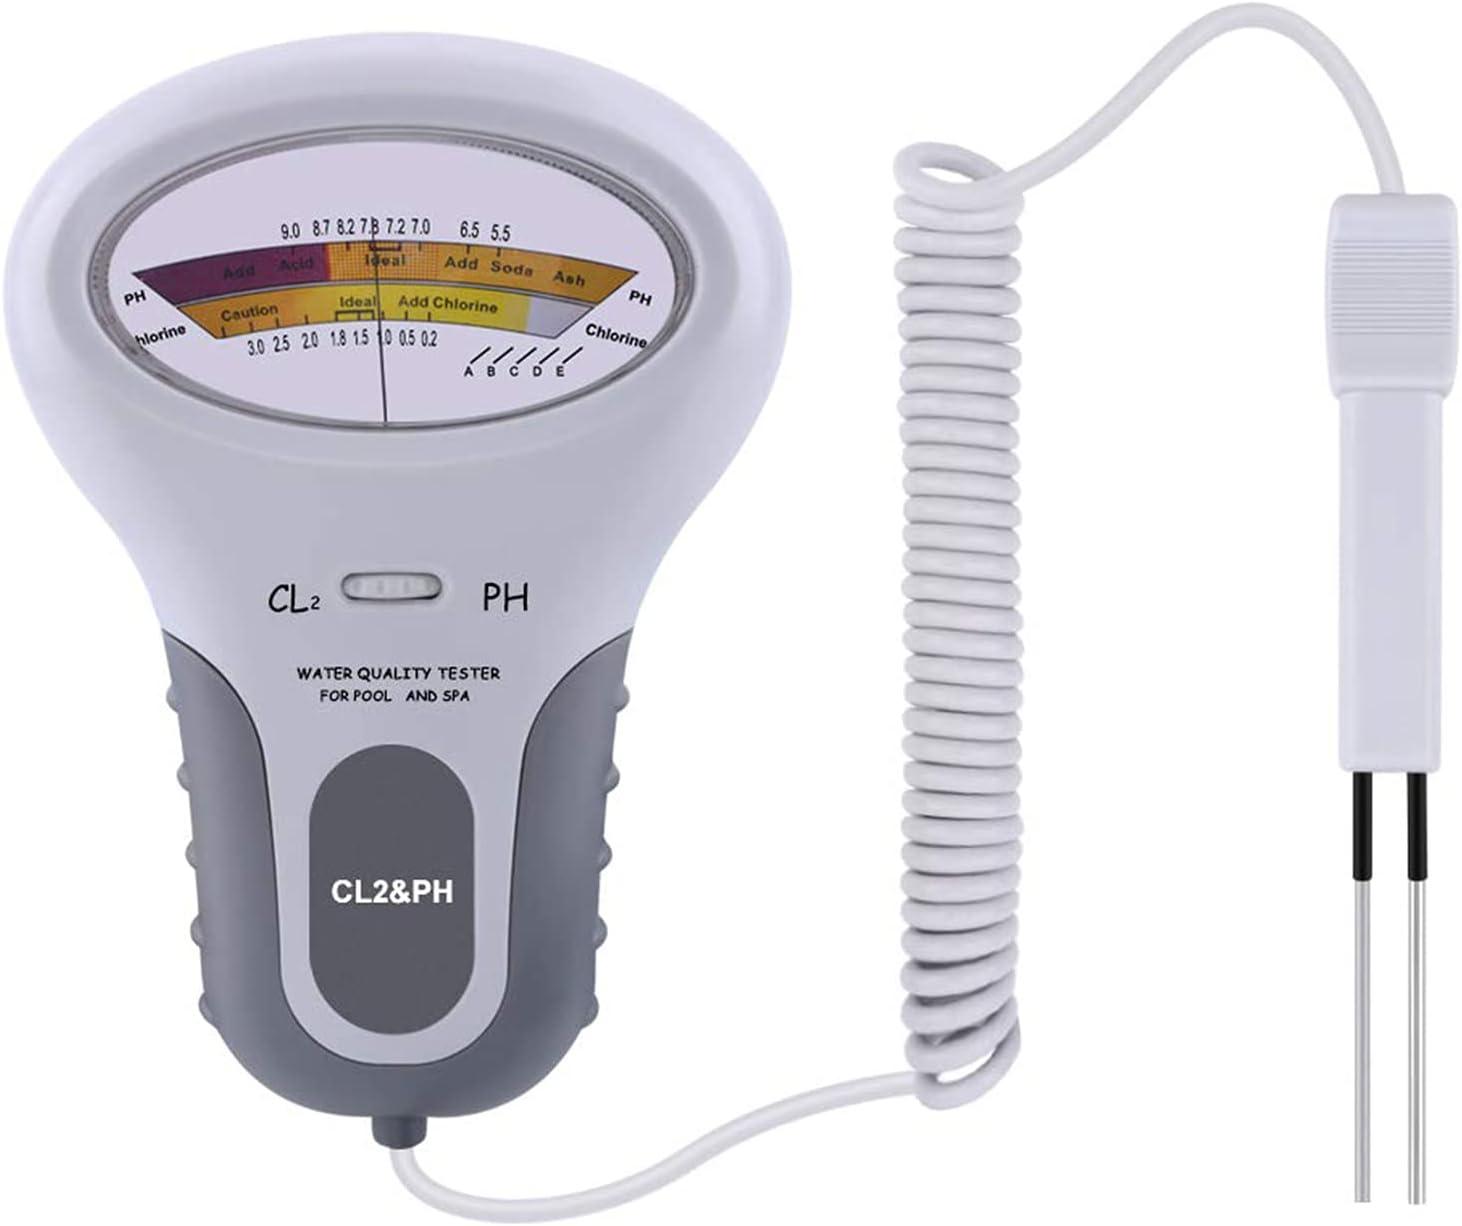 DIFCUL Medidor de cloro PH 2 en 1, medidor de agua de pH, medidor de calidad CL2, para piscina, acuario, spa, piscina